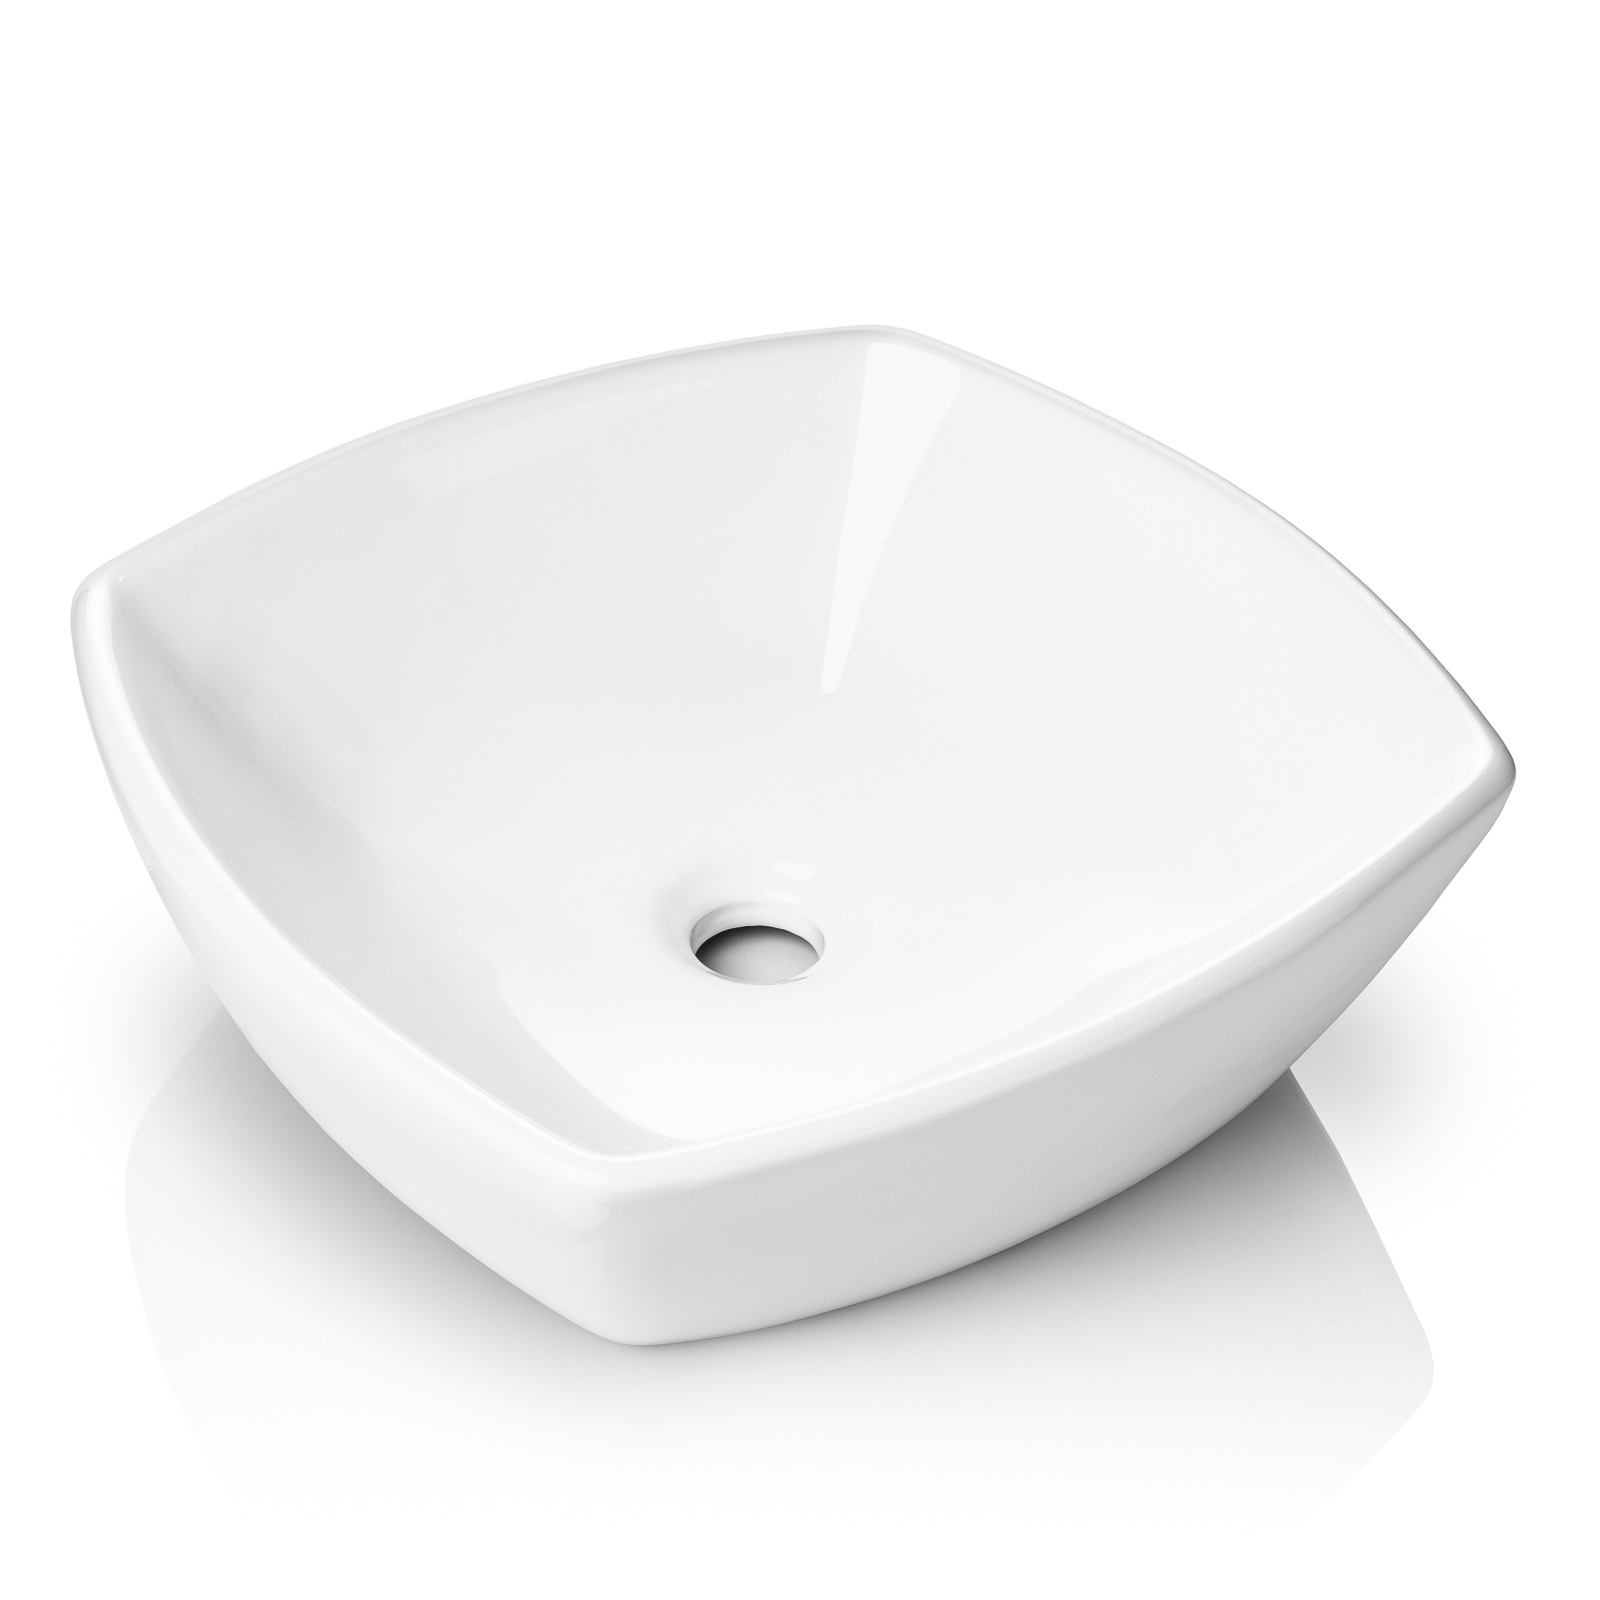 miligore 16 x 16 flared square white ceramic vessel sink modern above counter bathroom vanity bowl